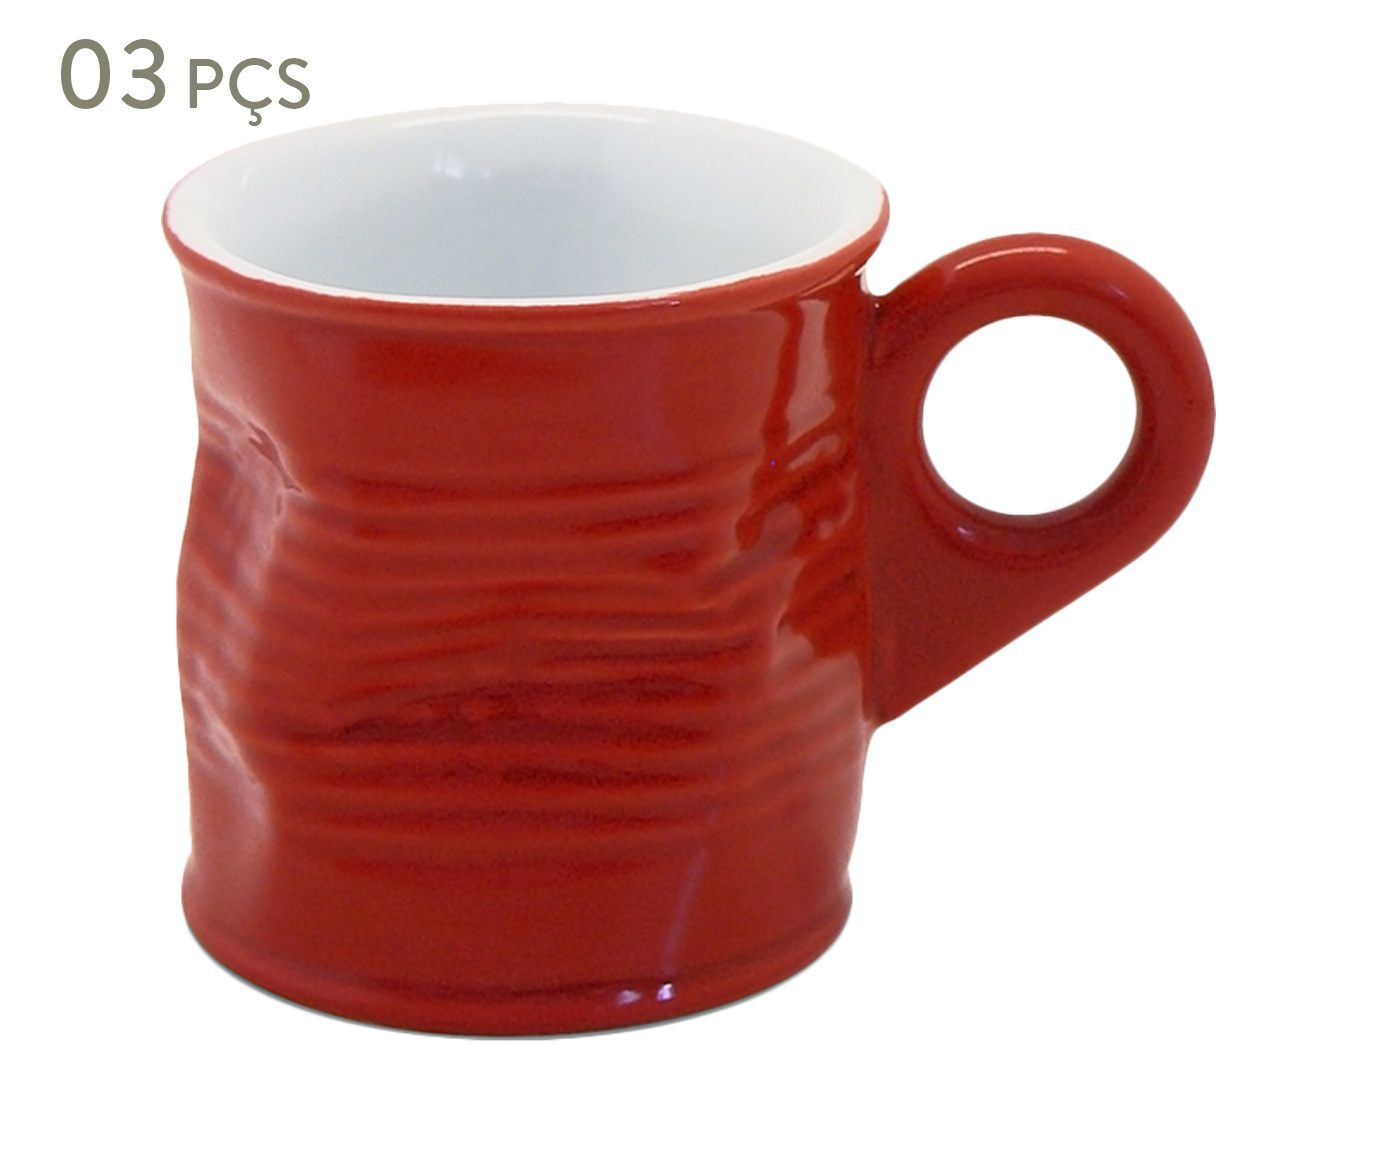 Conjunto de Xícaras para café Smashed - rouge 70 ml   Westwing.com.br